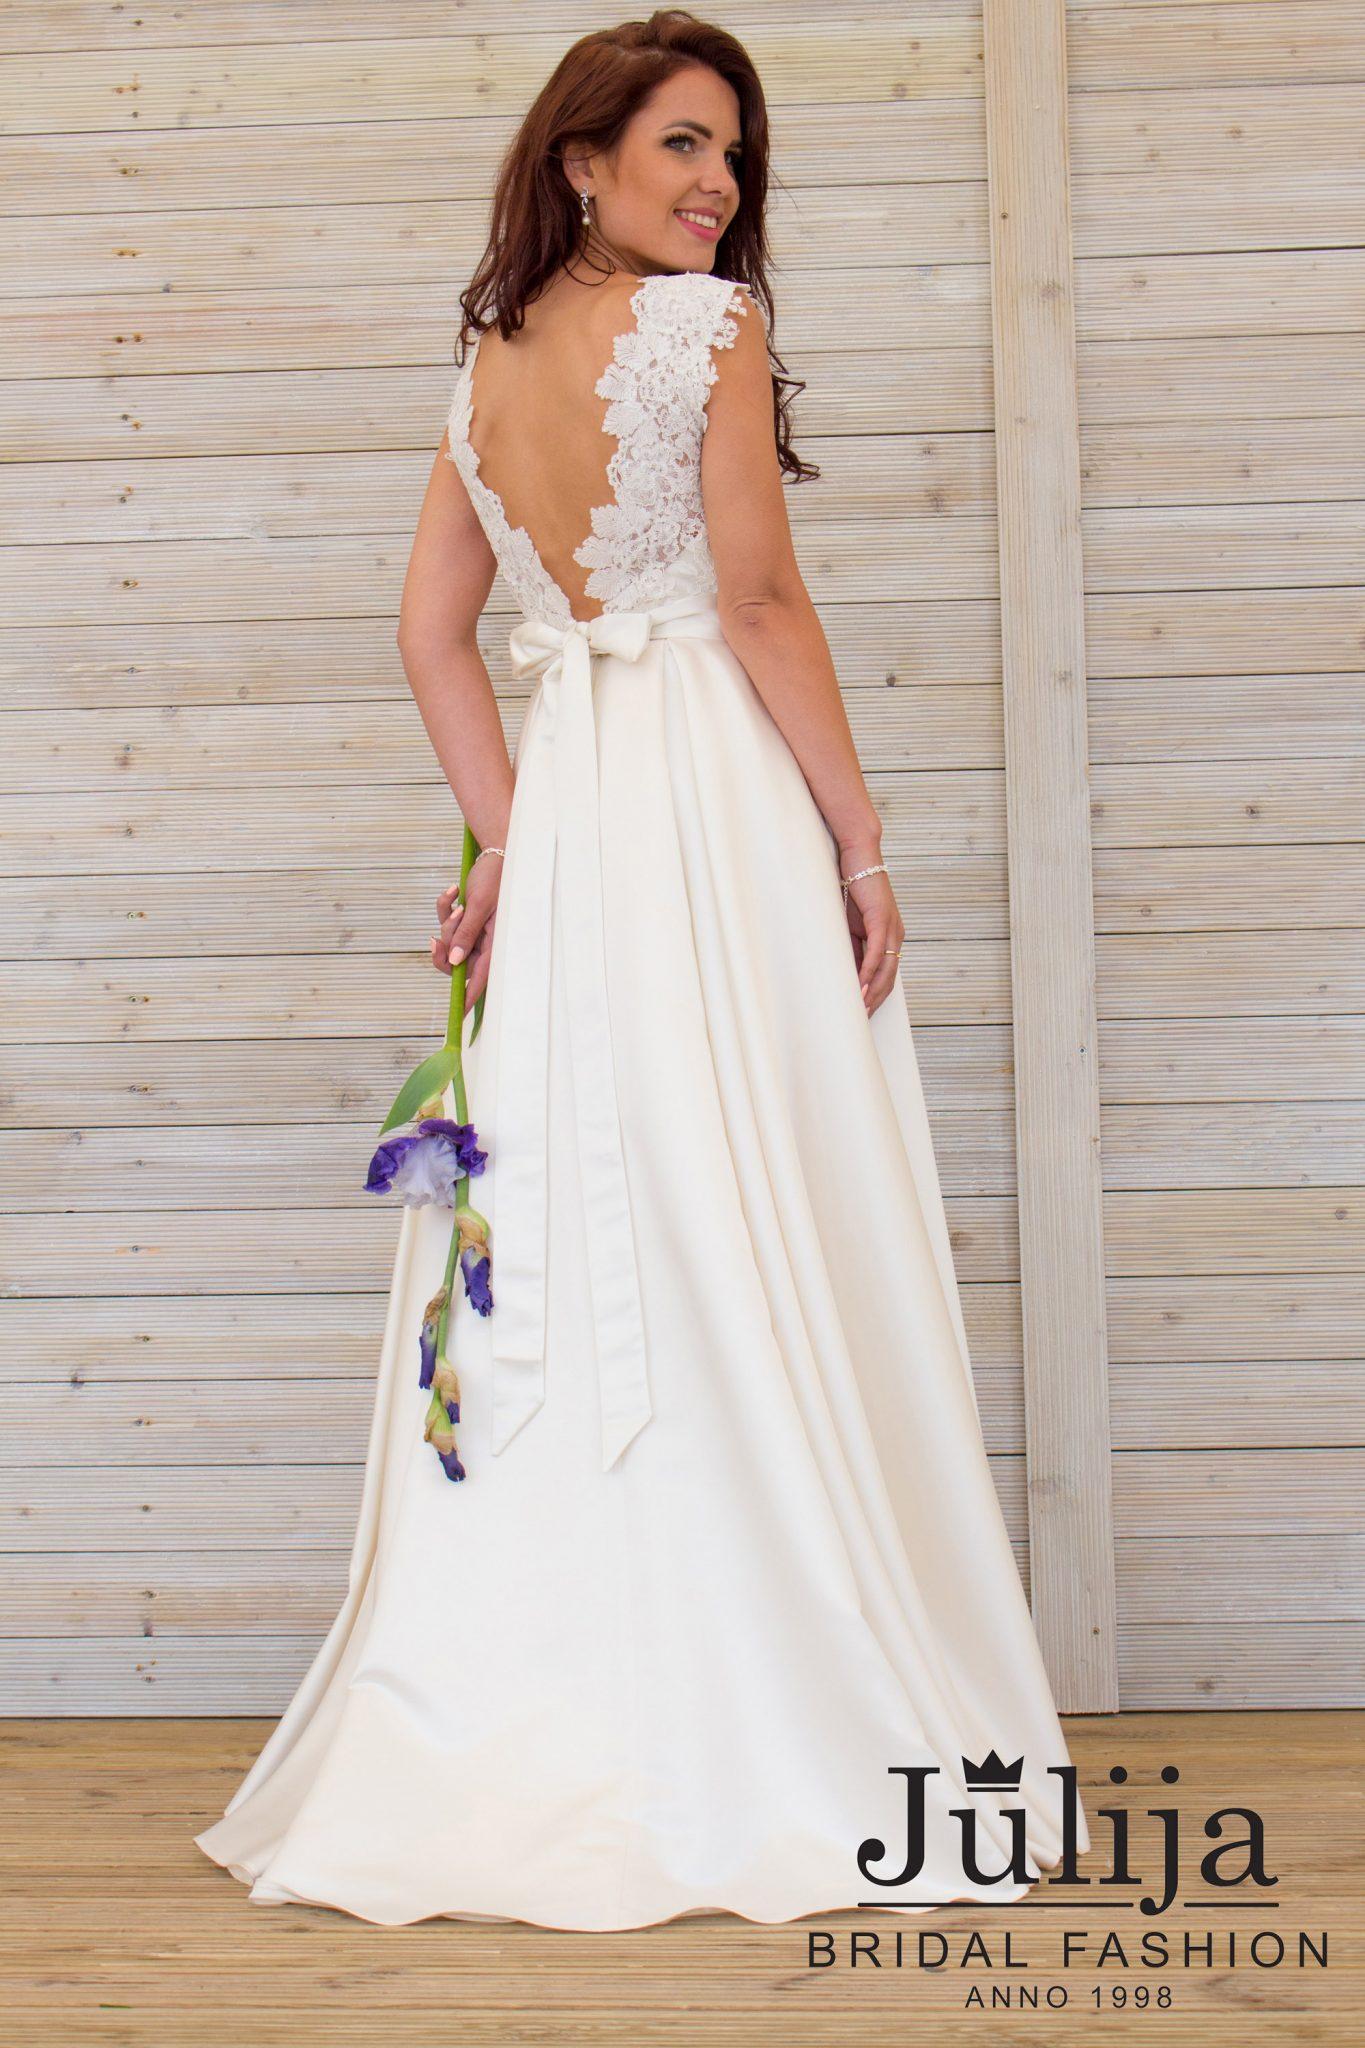 Abigail | Wholesale wedding dresses - Julija Bridal Fashion